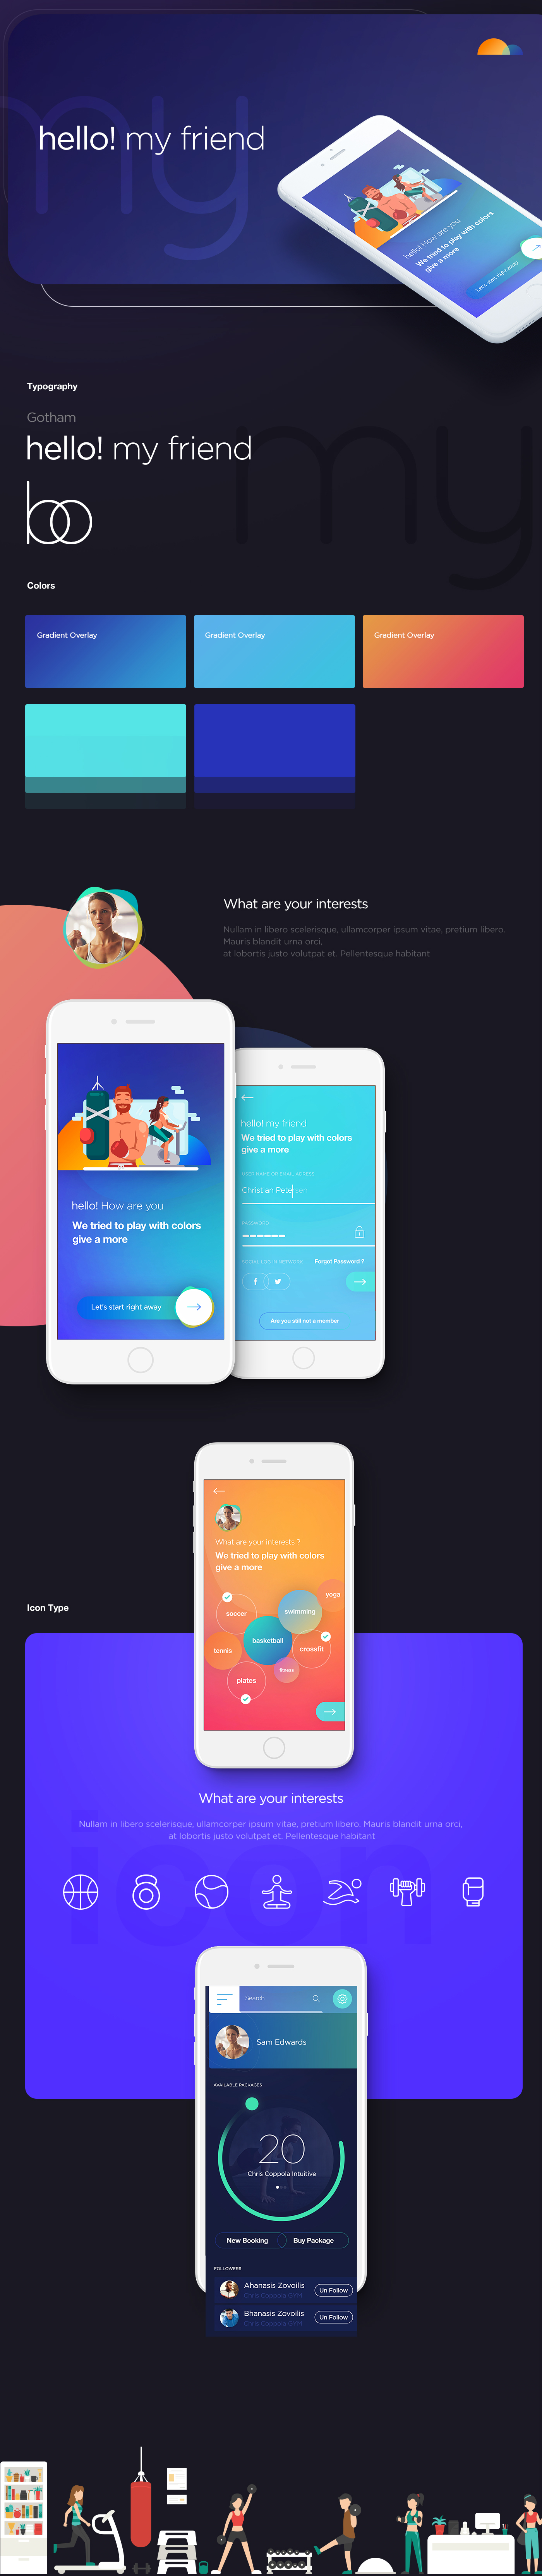 iPhone x fitness app color logo Web